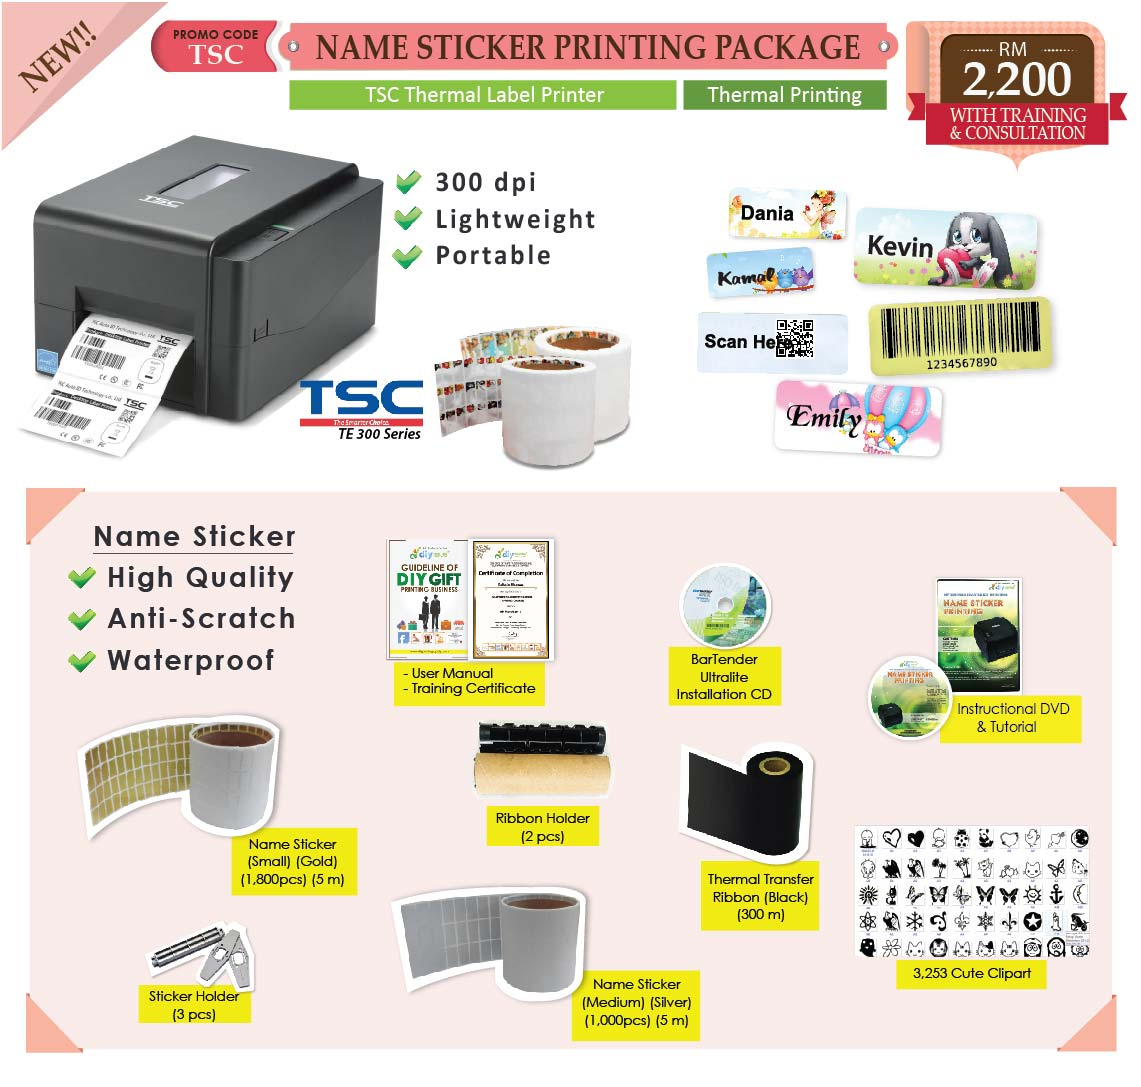 Name sticker printing